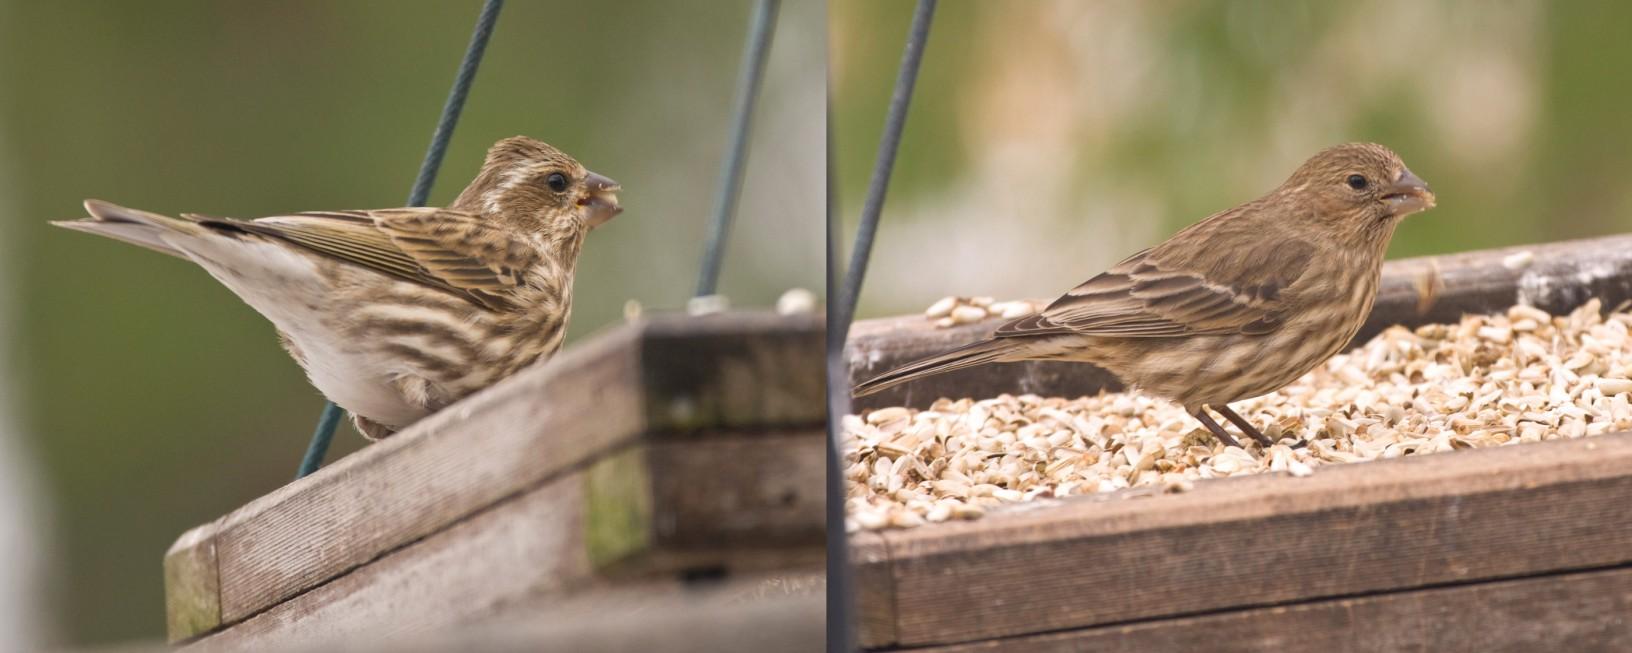 Left- female Purple Finch, Right- female House Finch